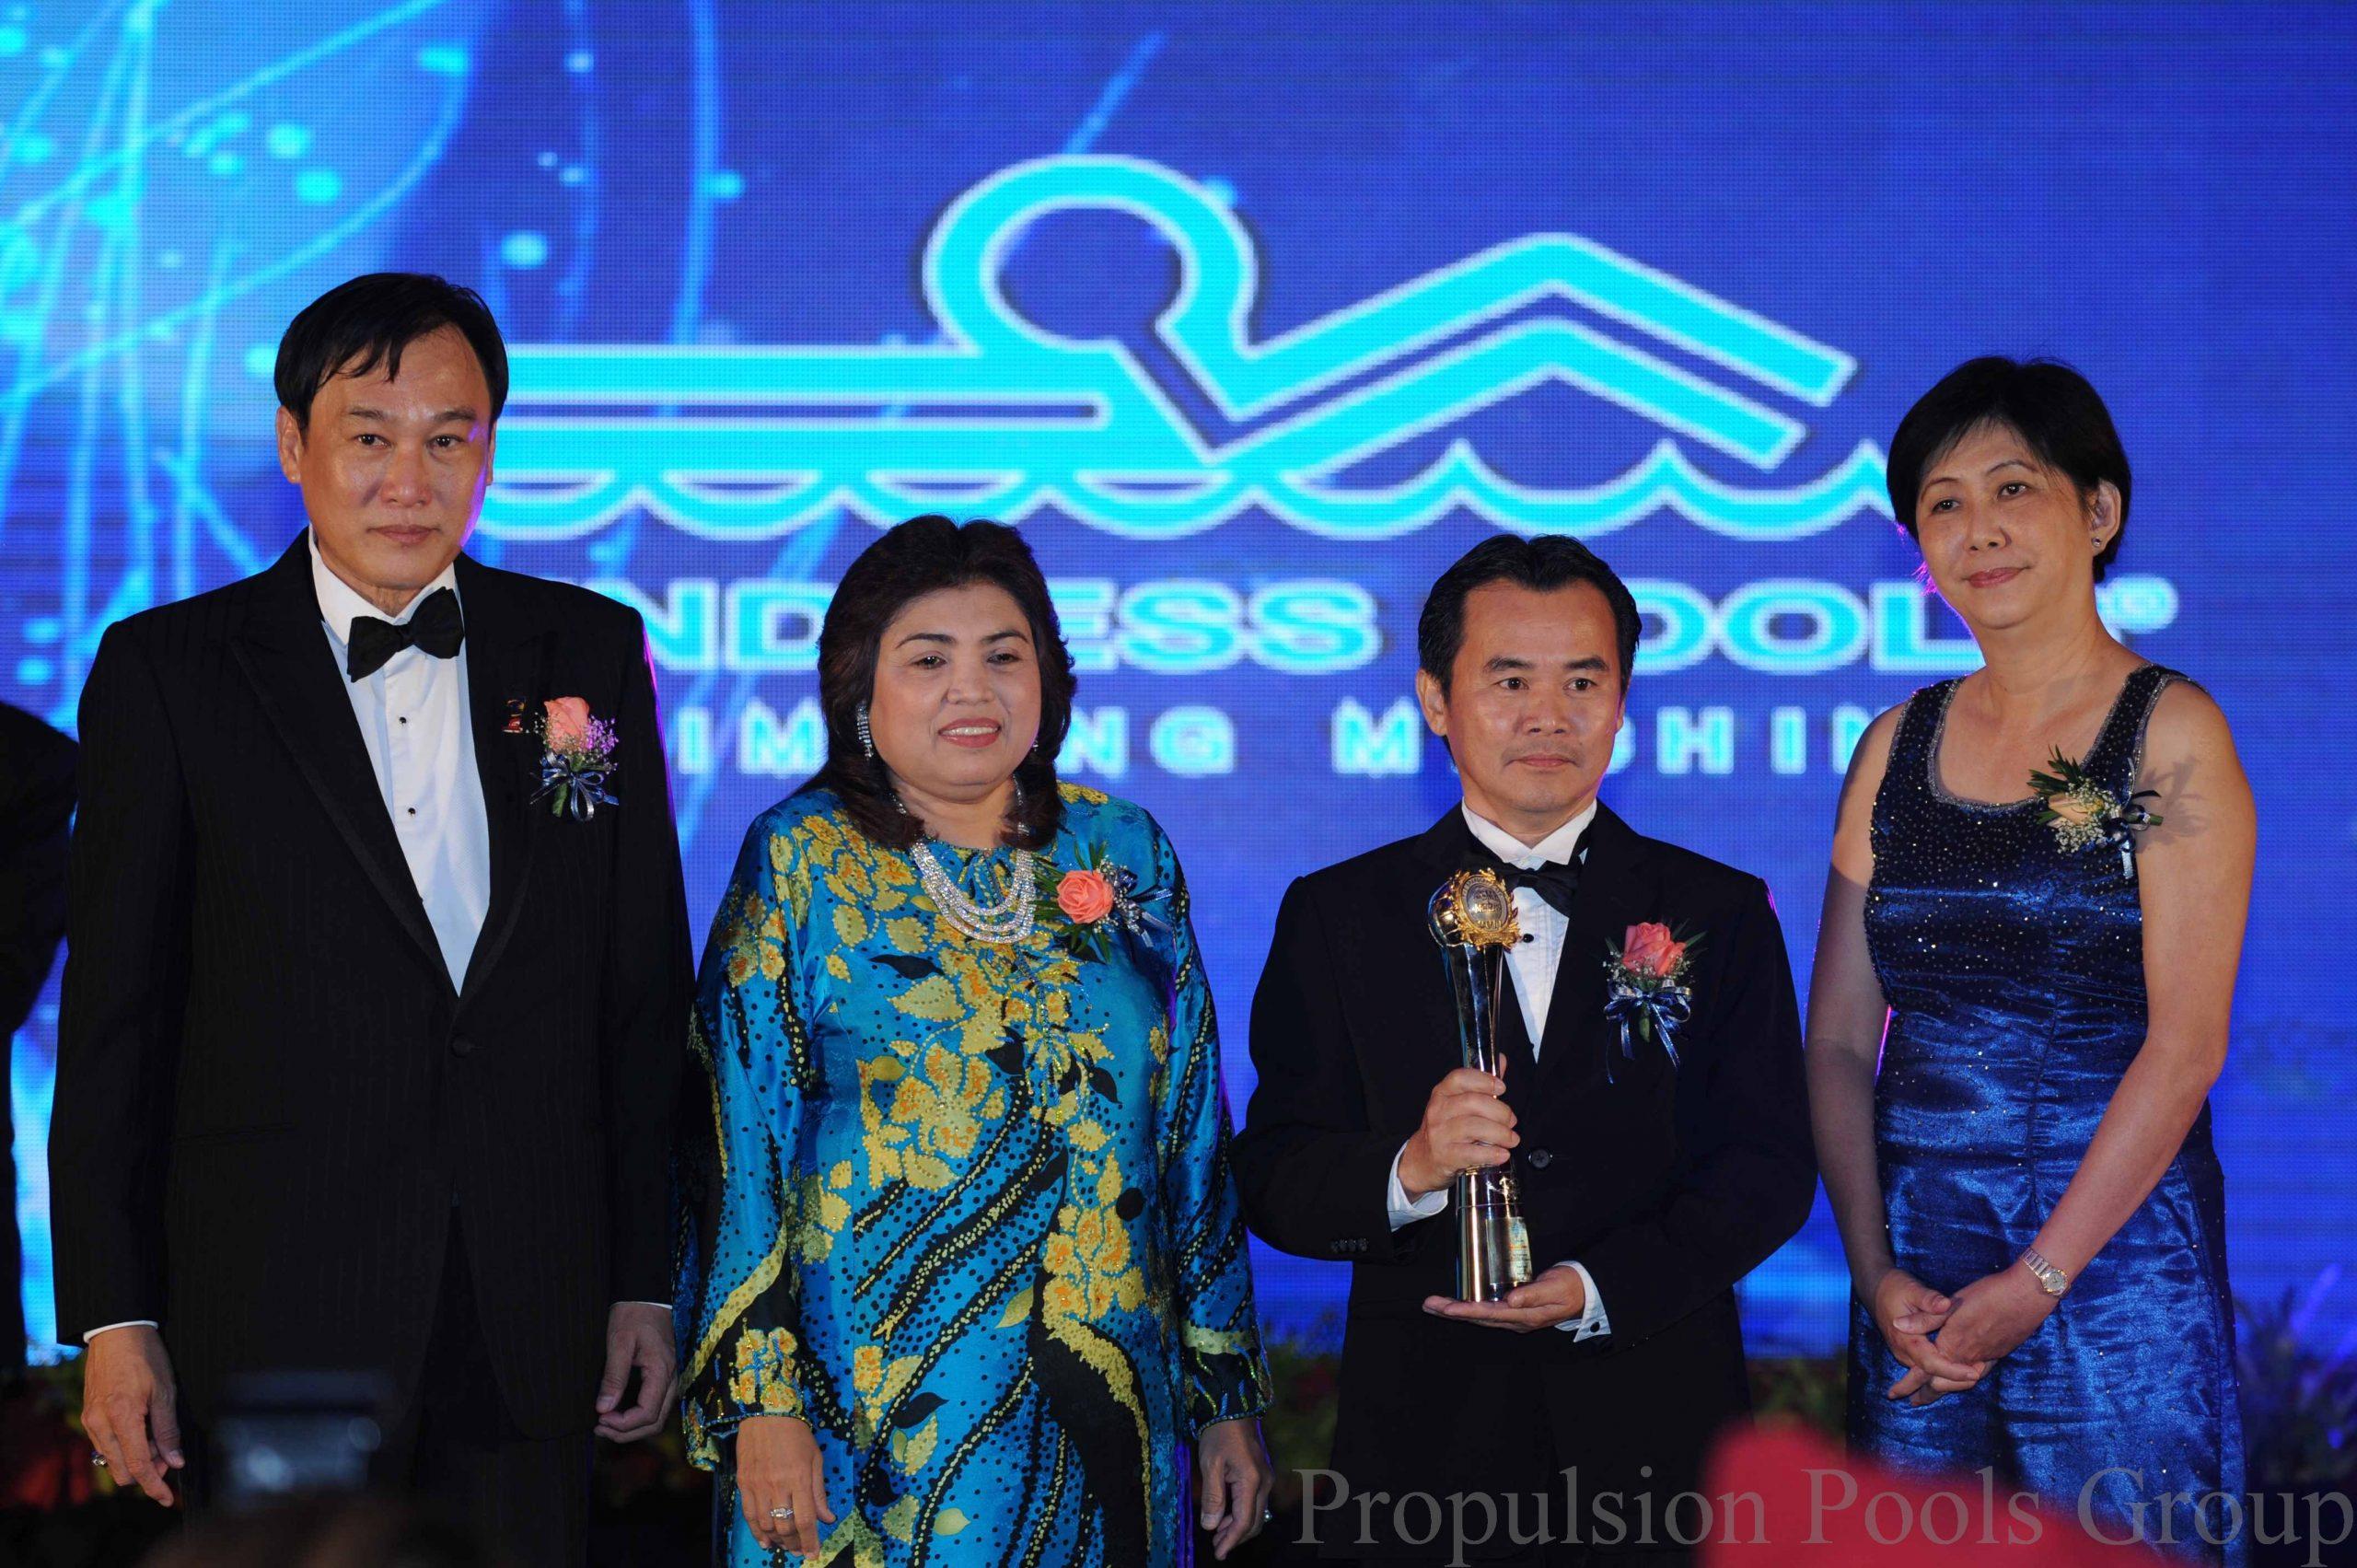 THE BEST BRANDS AWARDS 2011 2